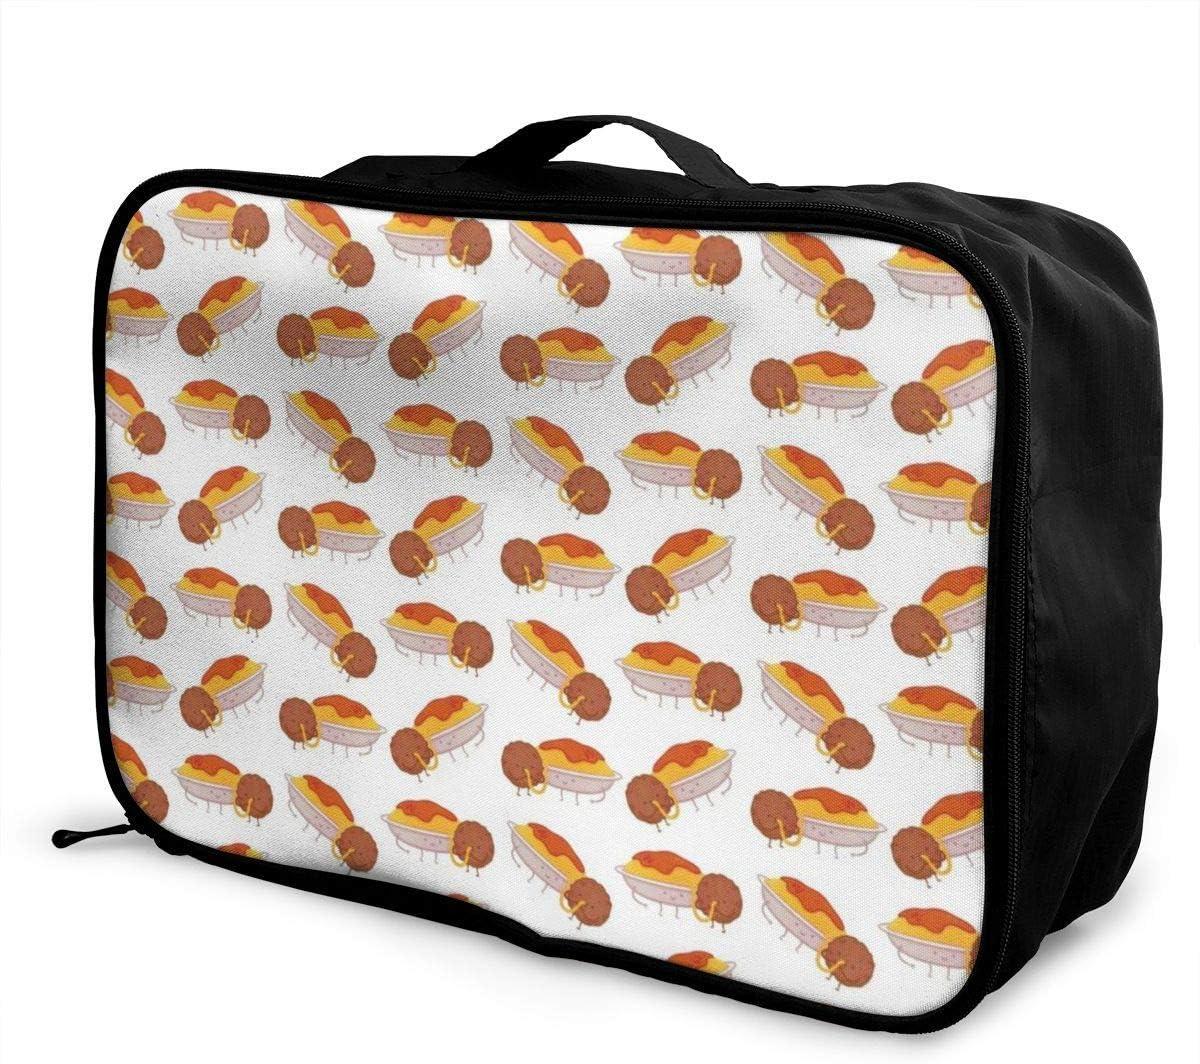 Spaghetti Dinner I Love Spaghetti Italian Pasta Travel Duffel Bag Waterproof Fashion Lightweight Large Capacity Portable Luggage Bag